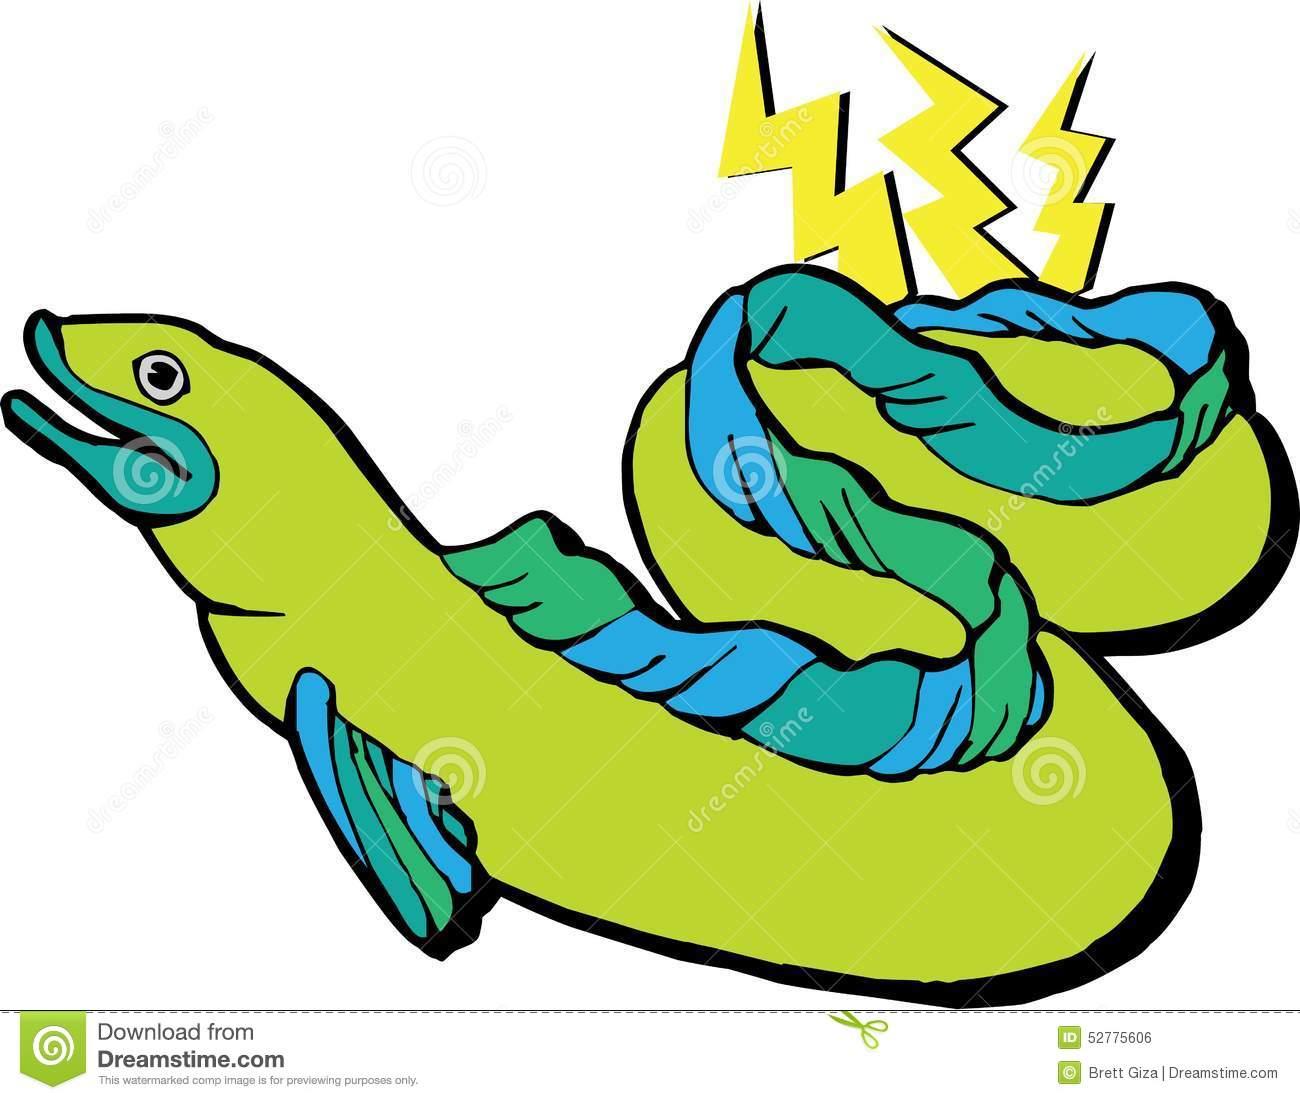 Electric eel clipart.